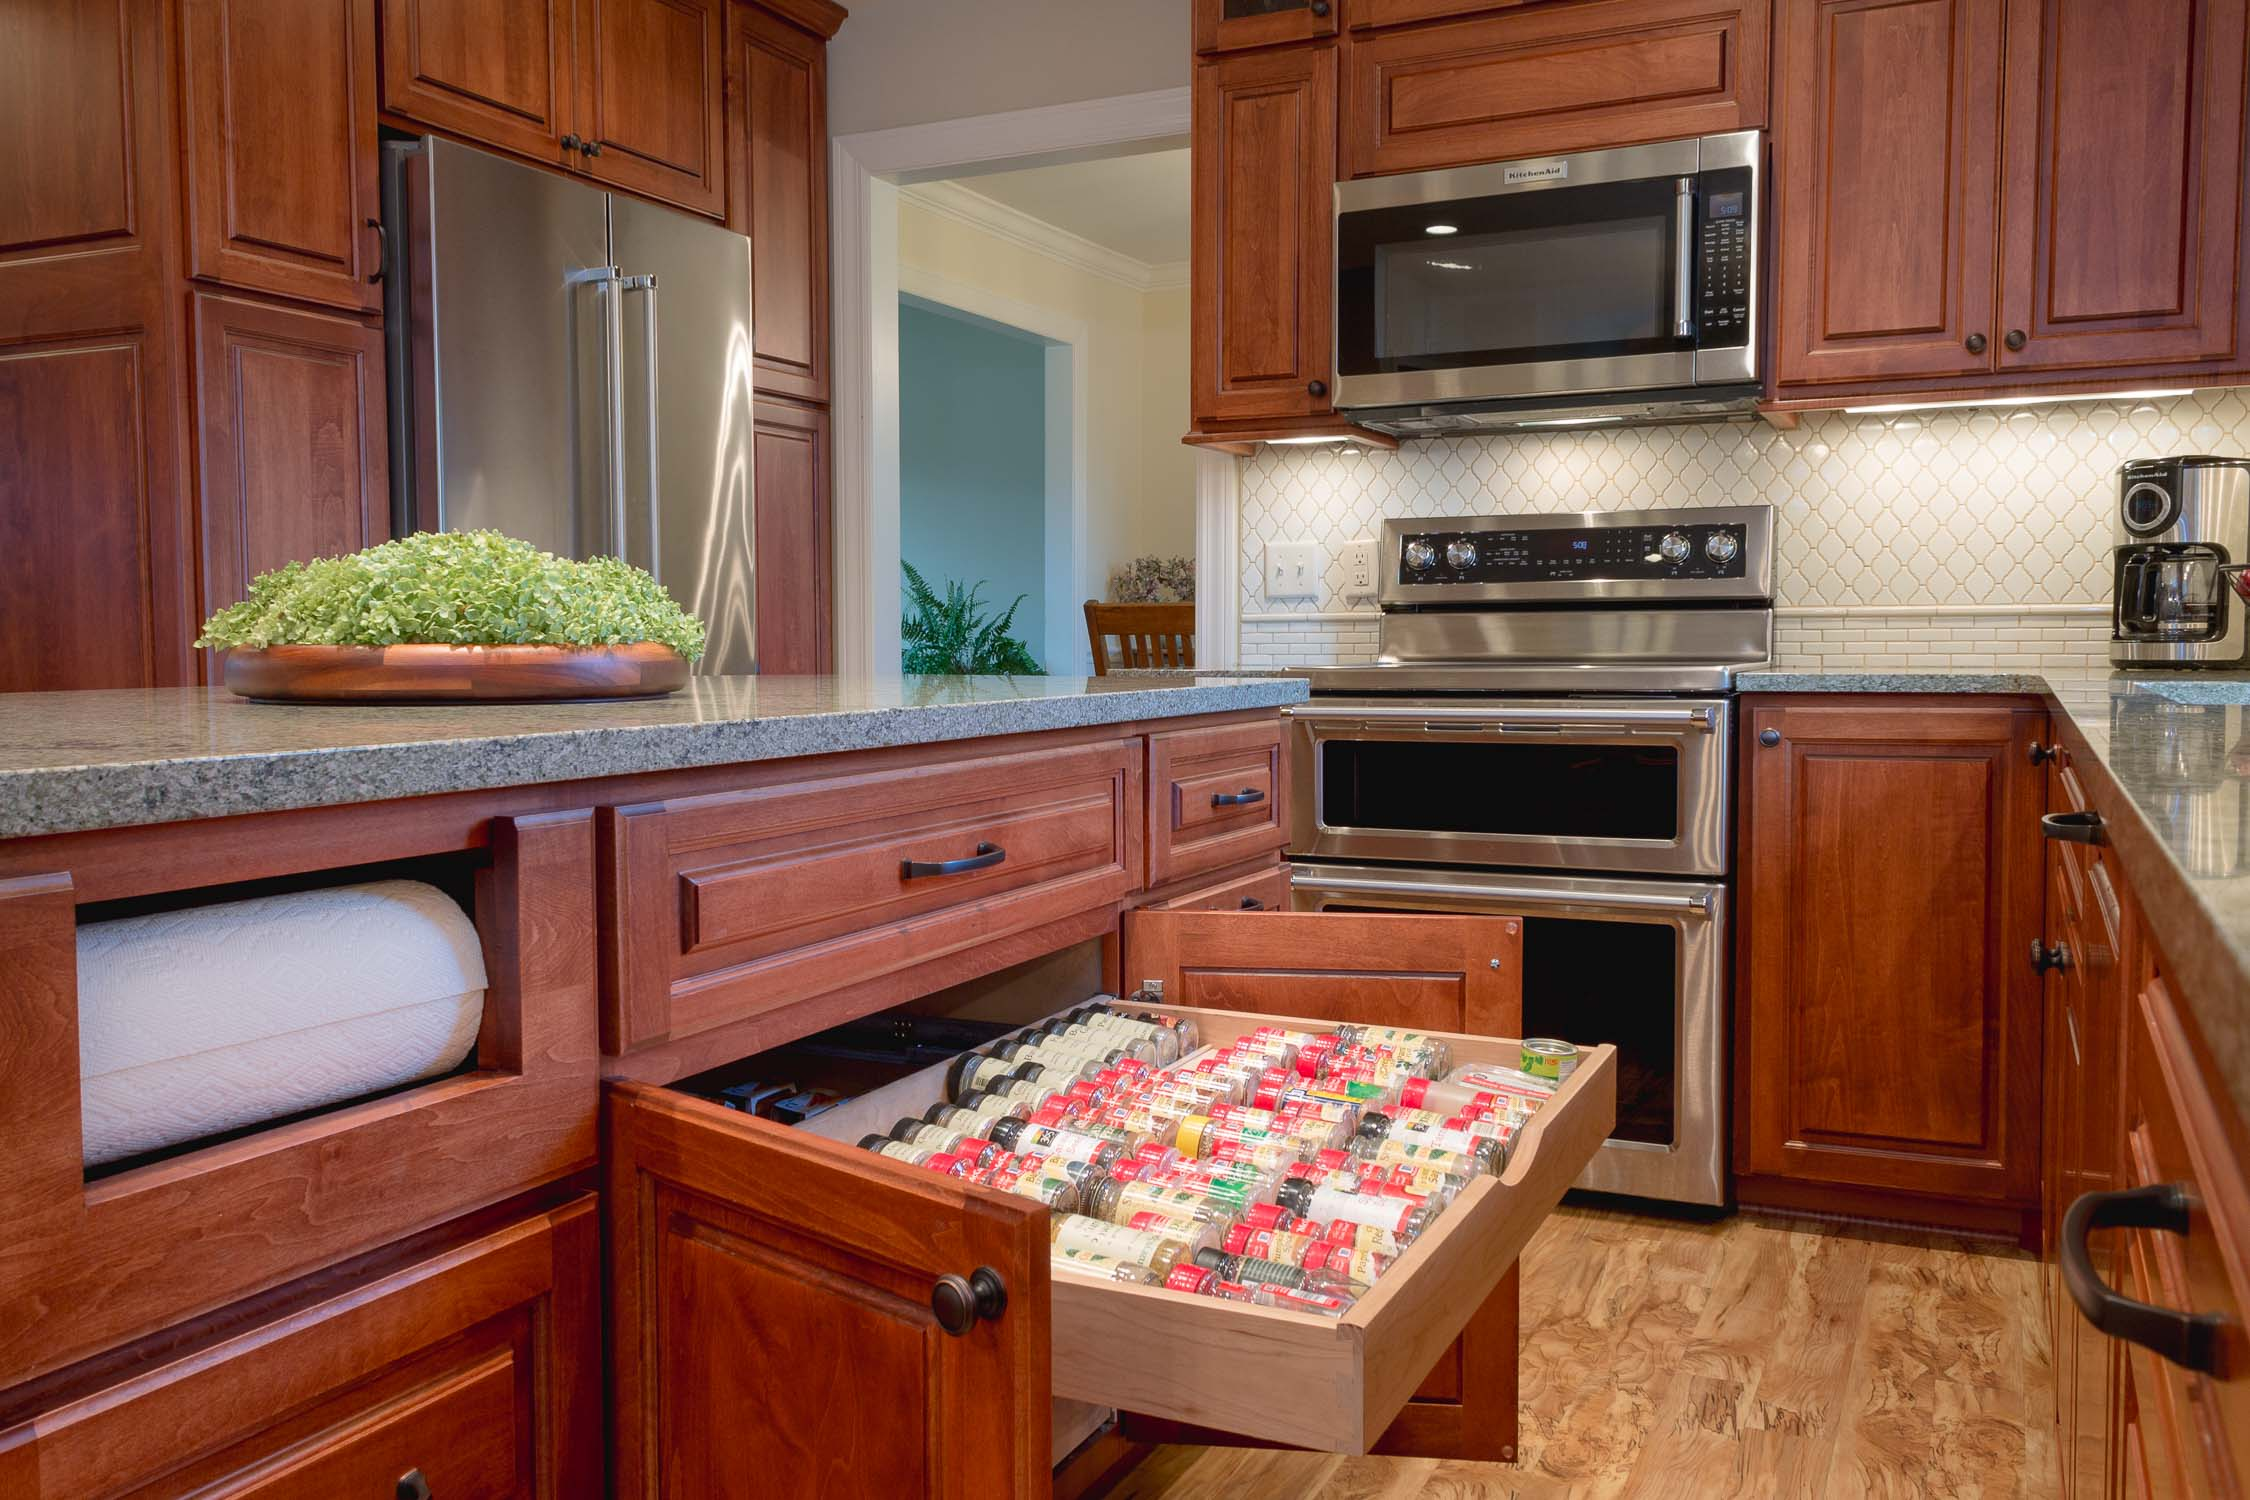 Small Kitchen Design Ideas That Maximize Storage Space